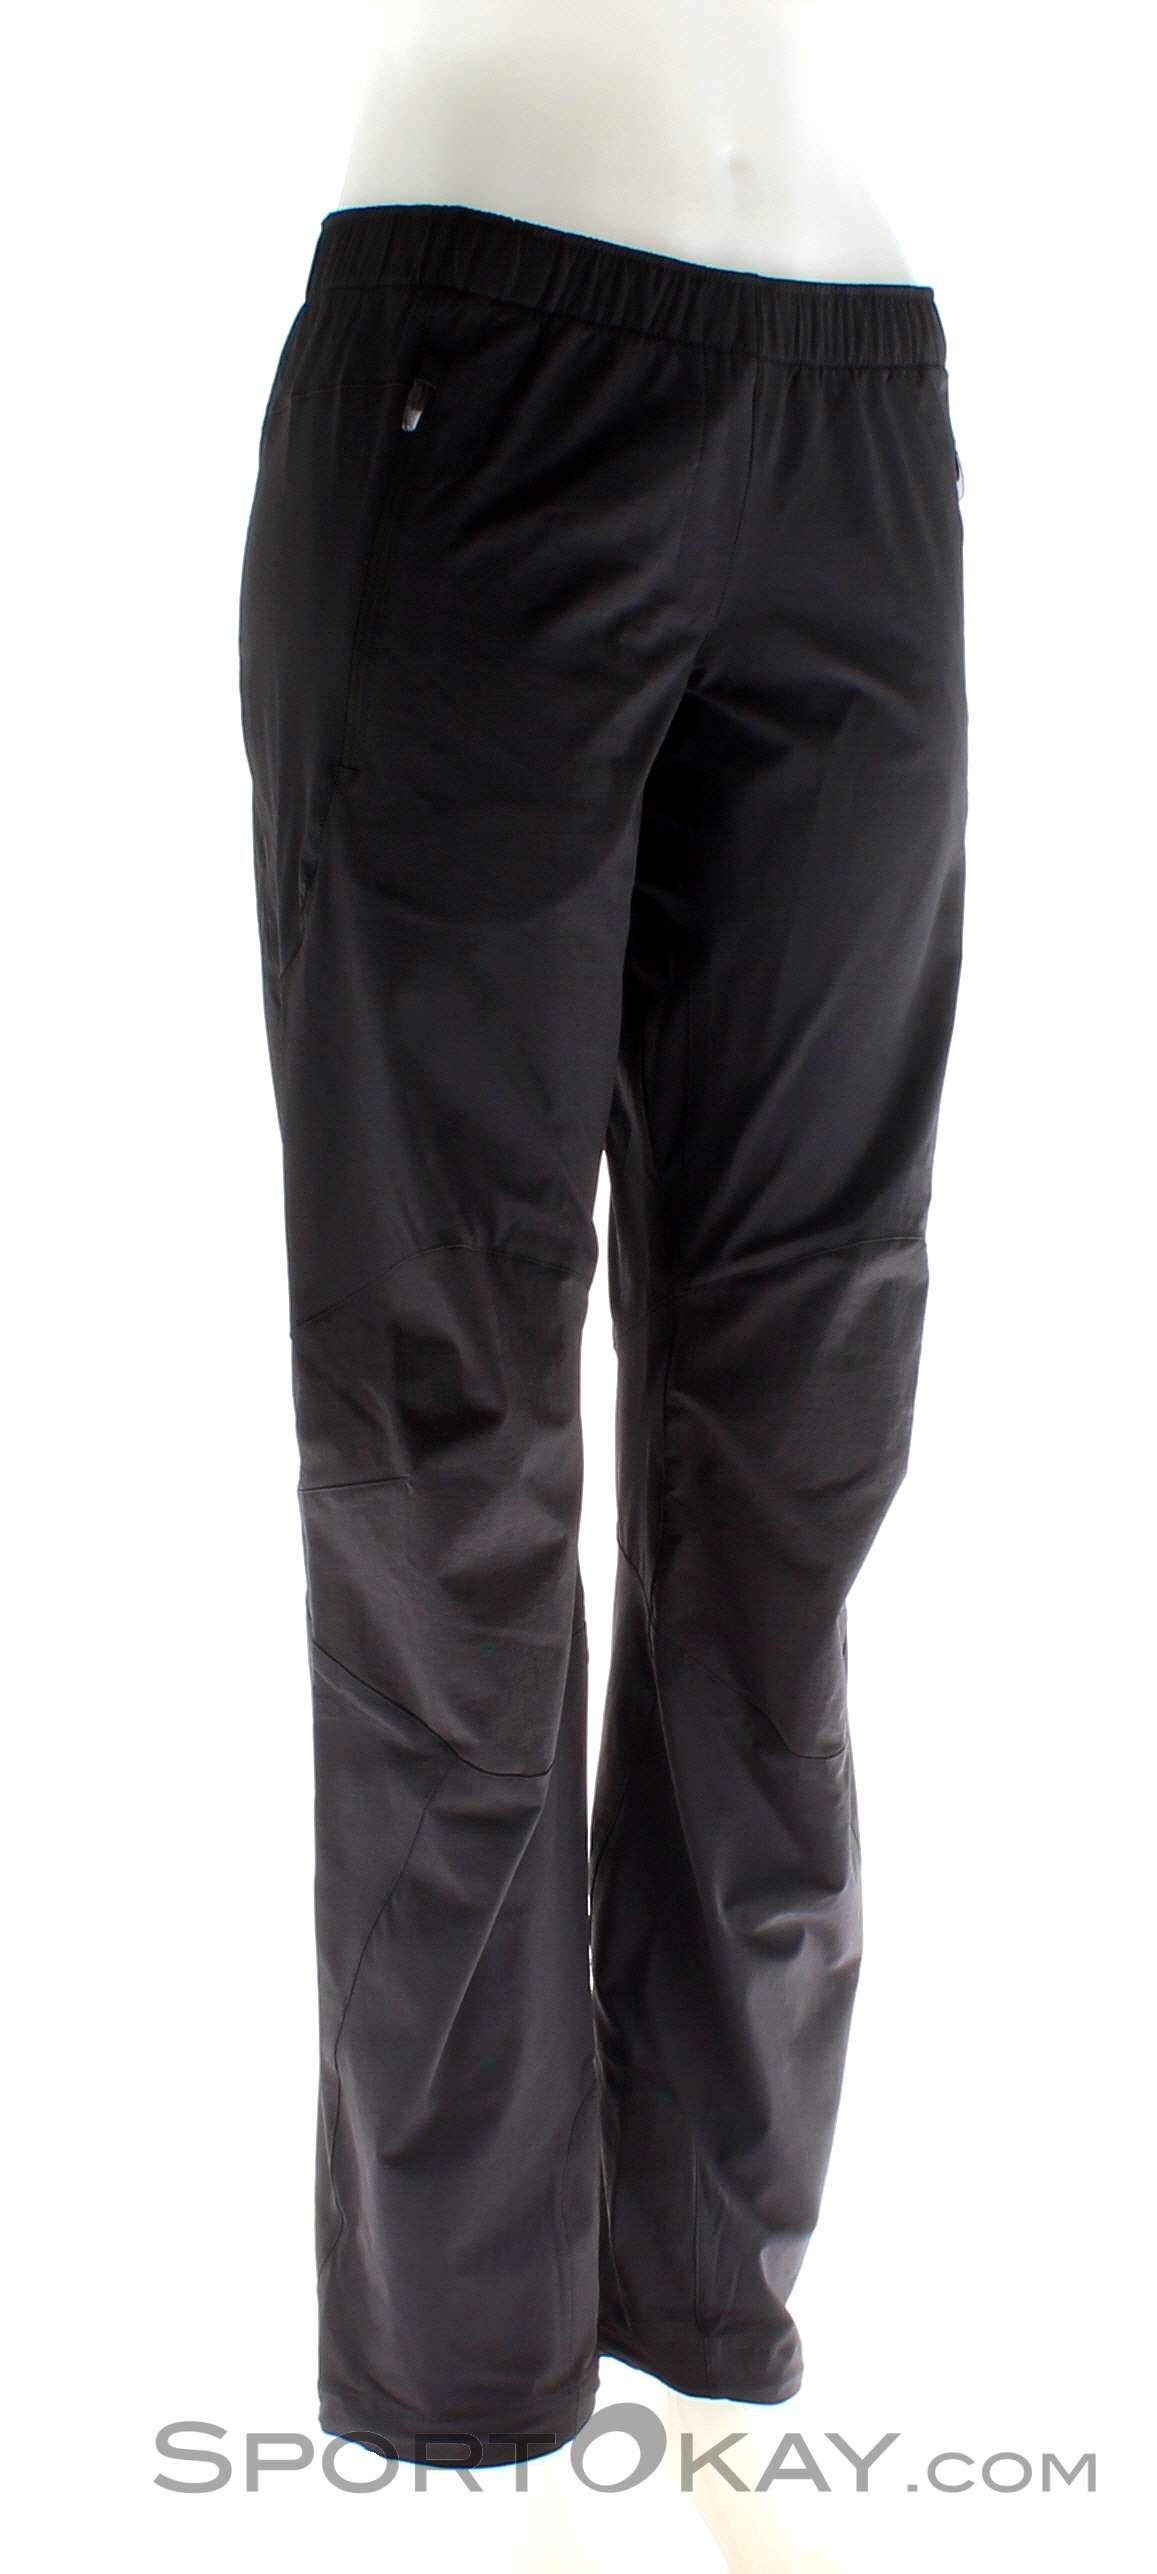 Adidas Multi TX Damen Outdoorhose-Schwarz-40